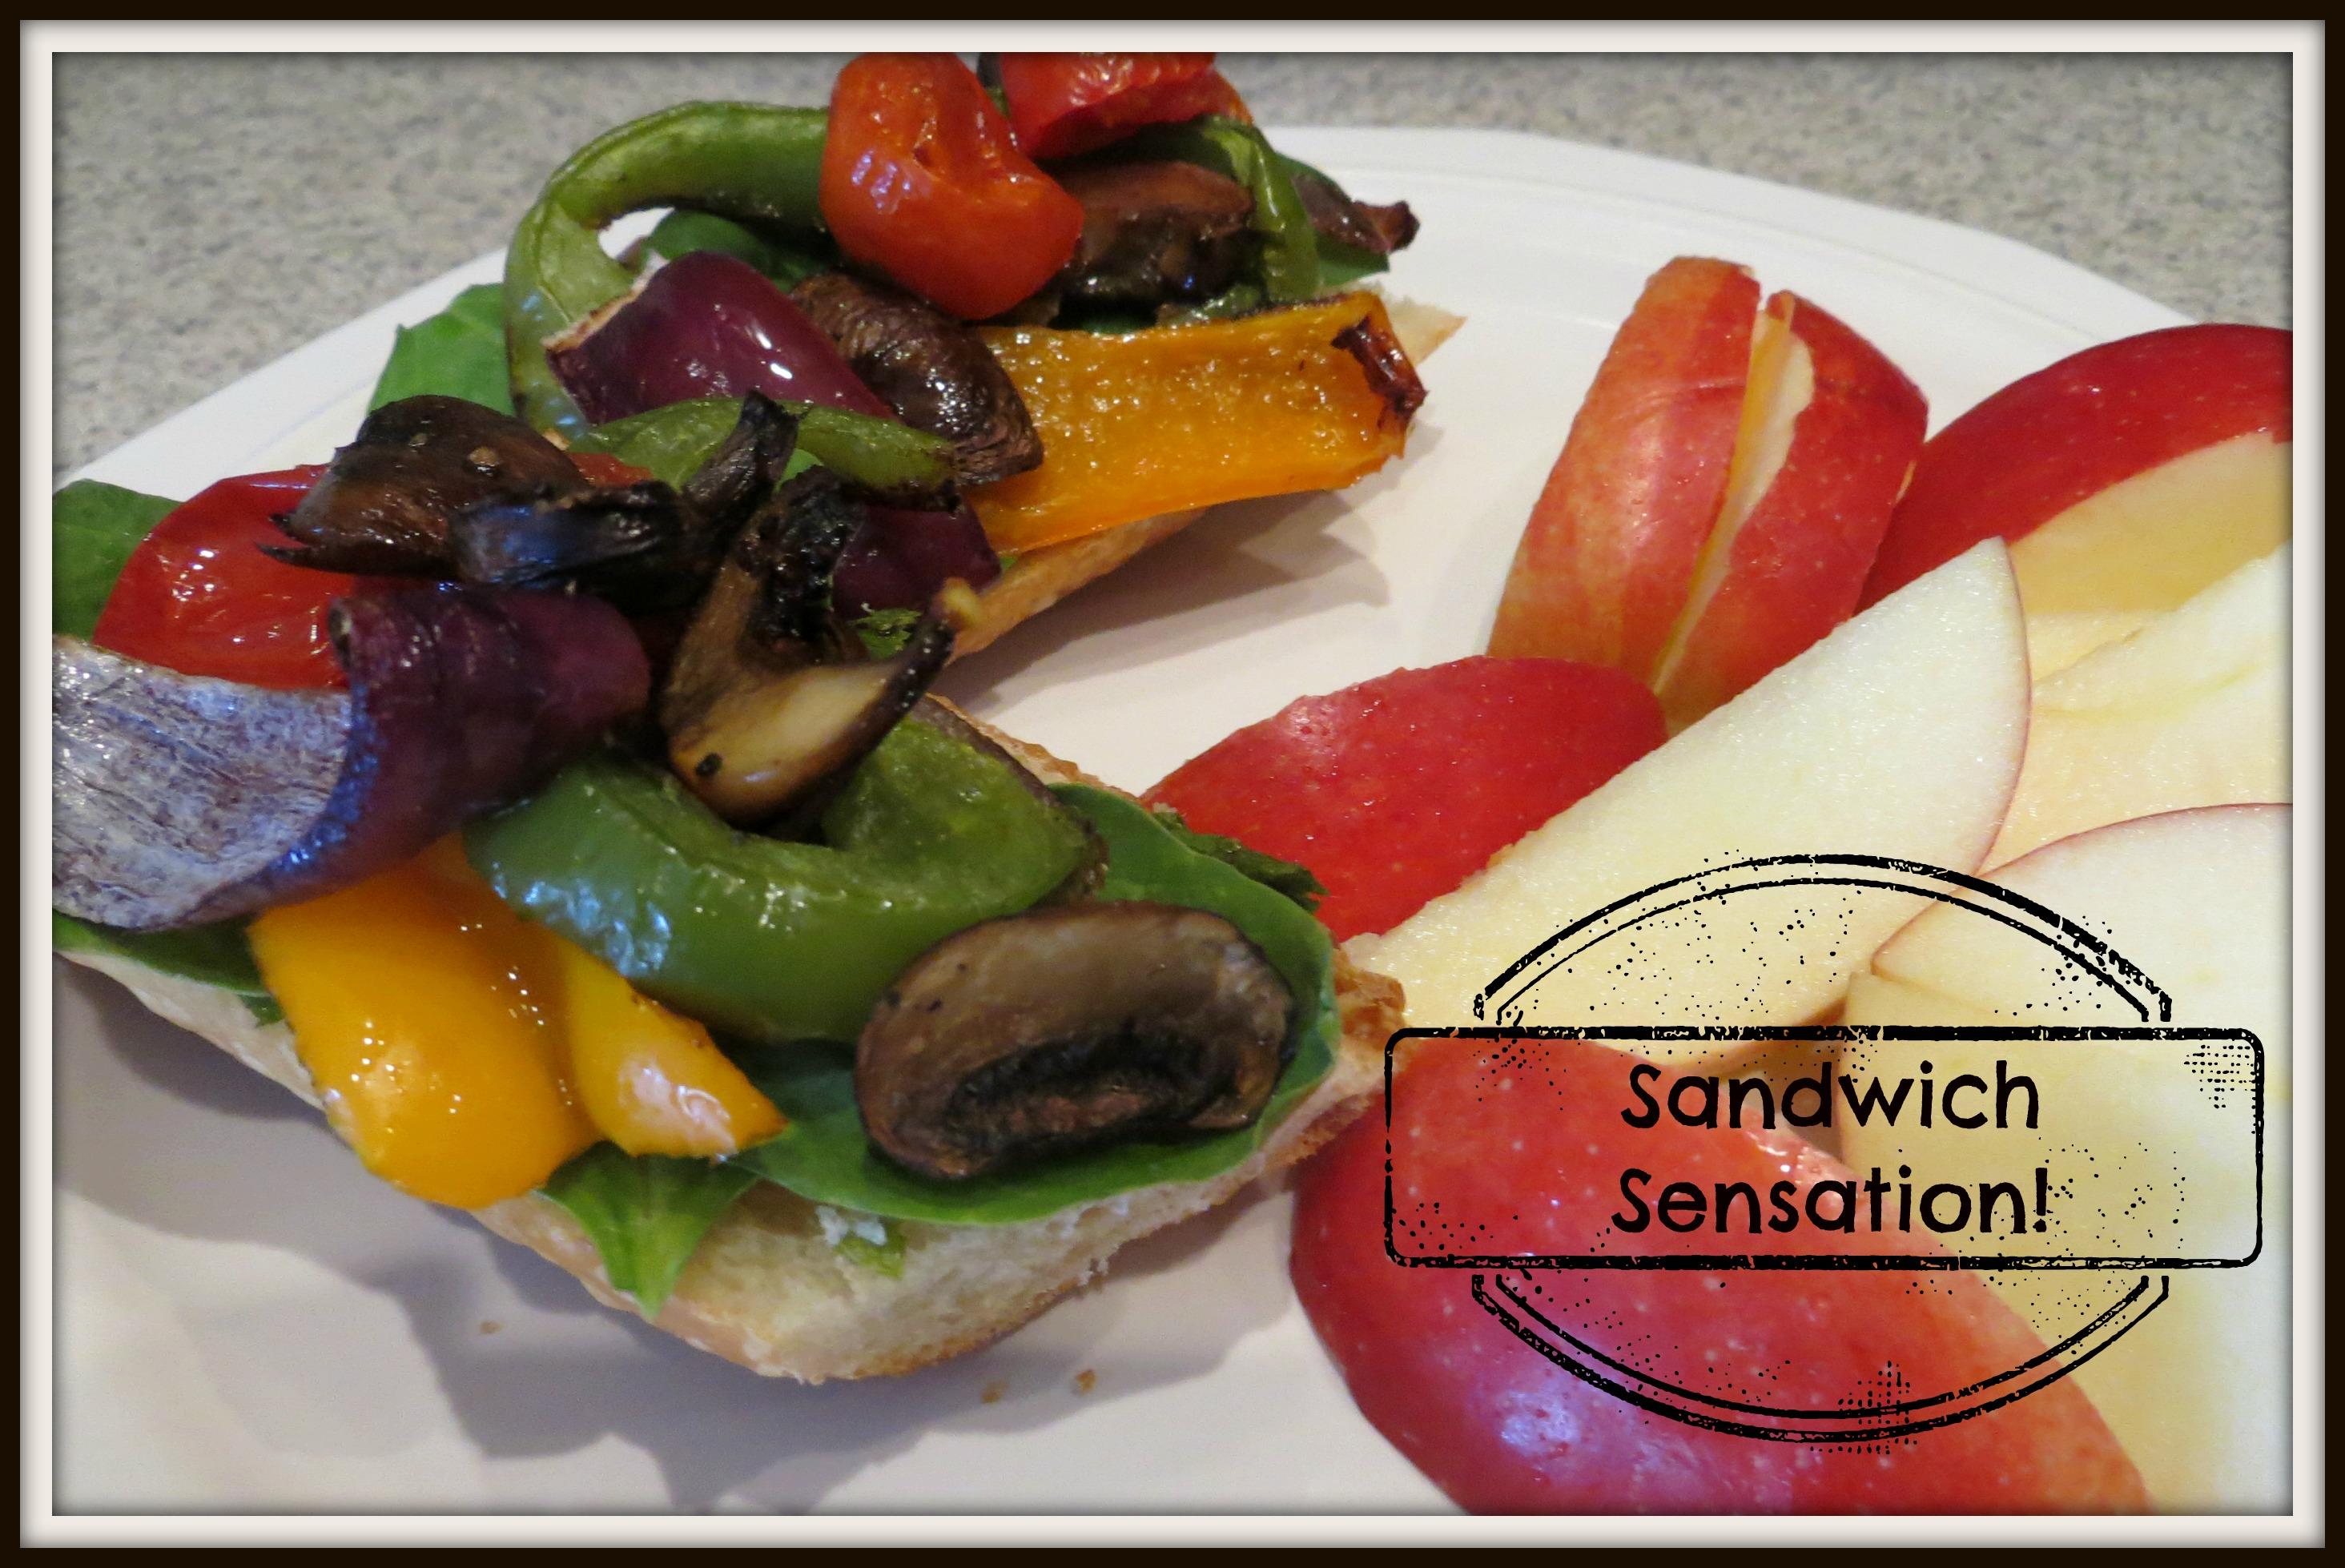 Sandwich Sensation